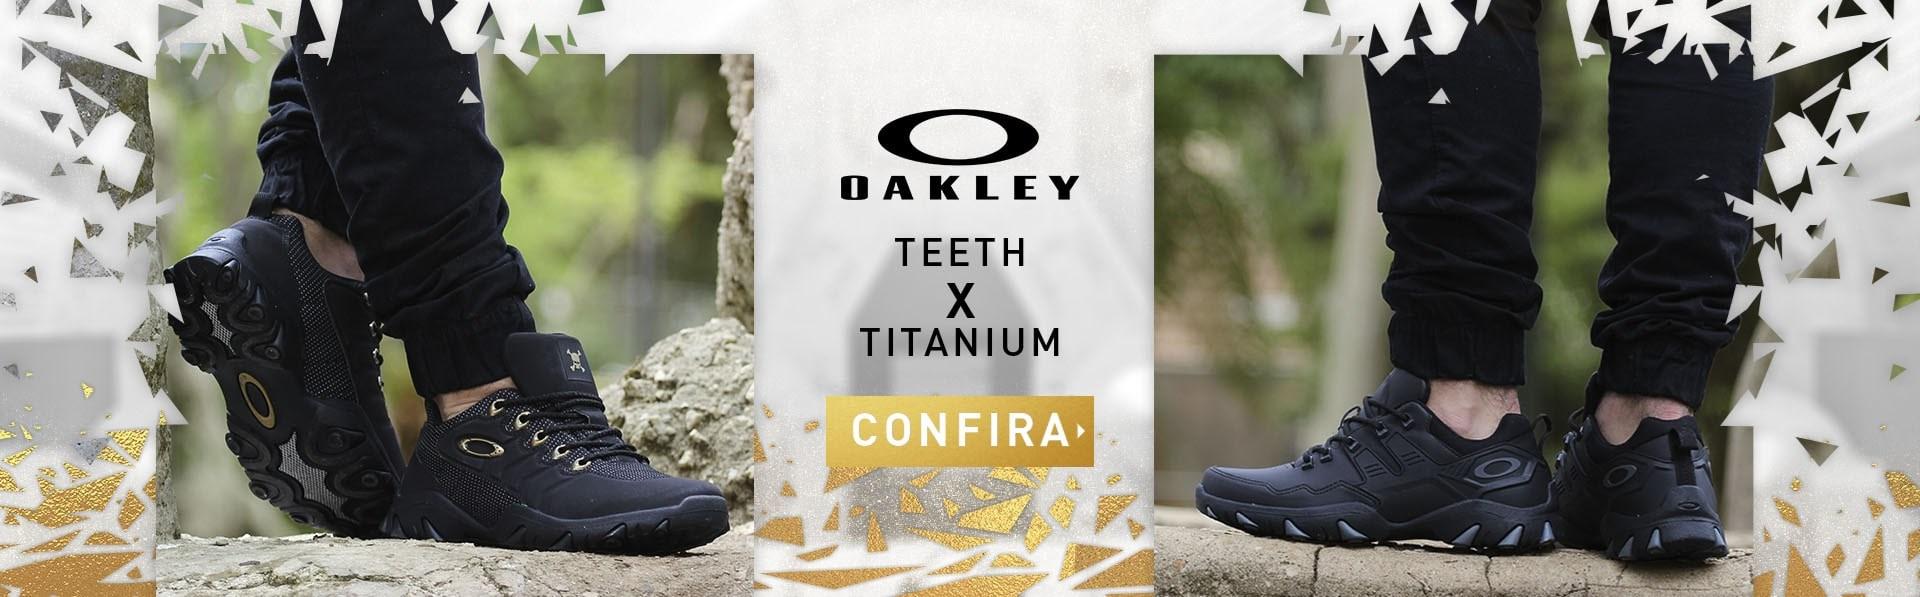 Oakley Teeth